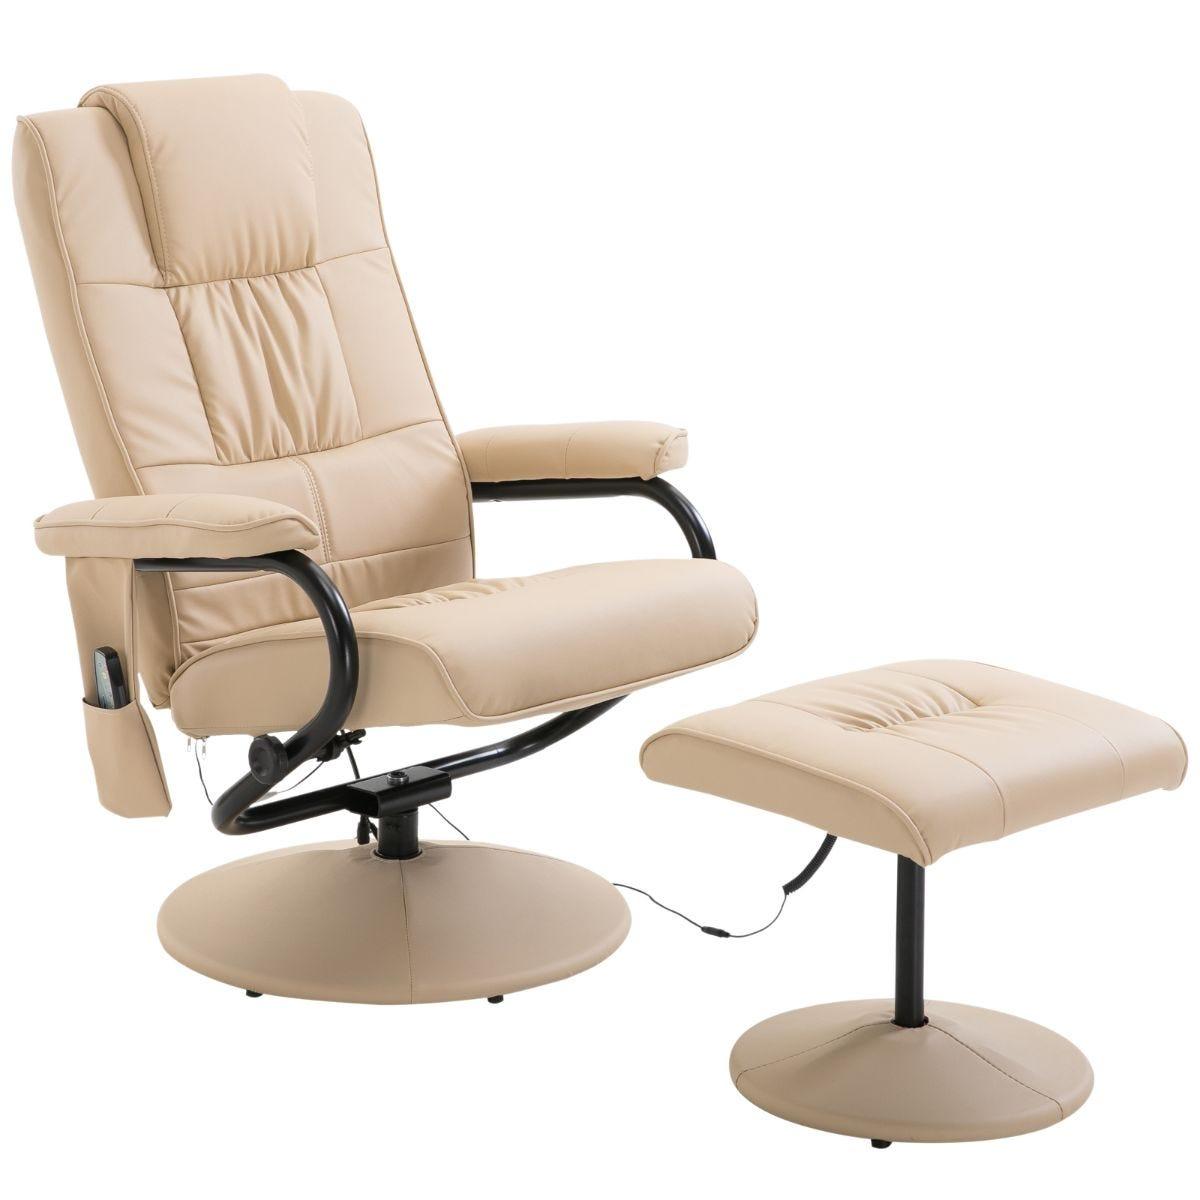 HOMCOM Electric Massage Chair Sofa Recliner Foot Stool 10 Point Massager